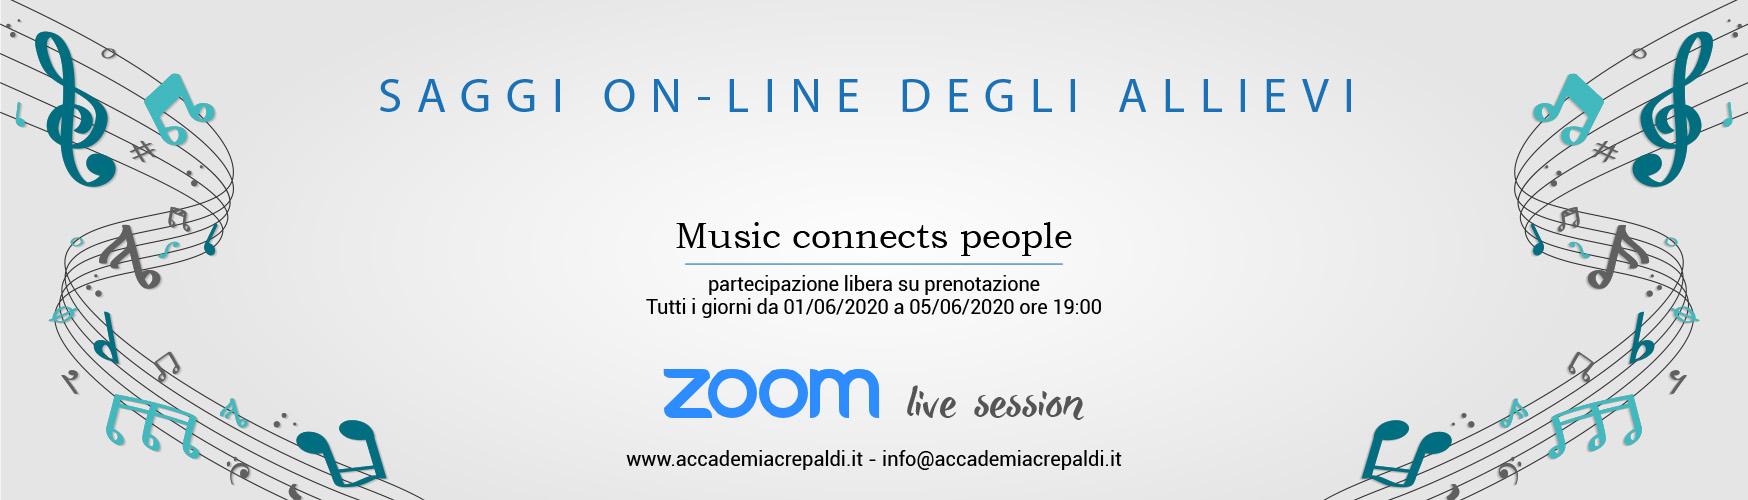 Saggi 19/20 on-line with Zoom - Accademia Musicale Crepaldi